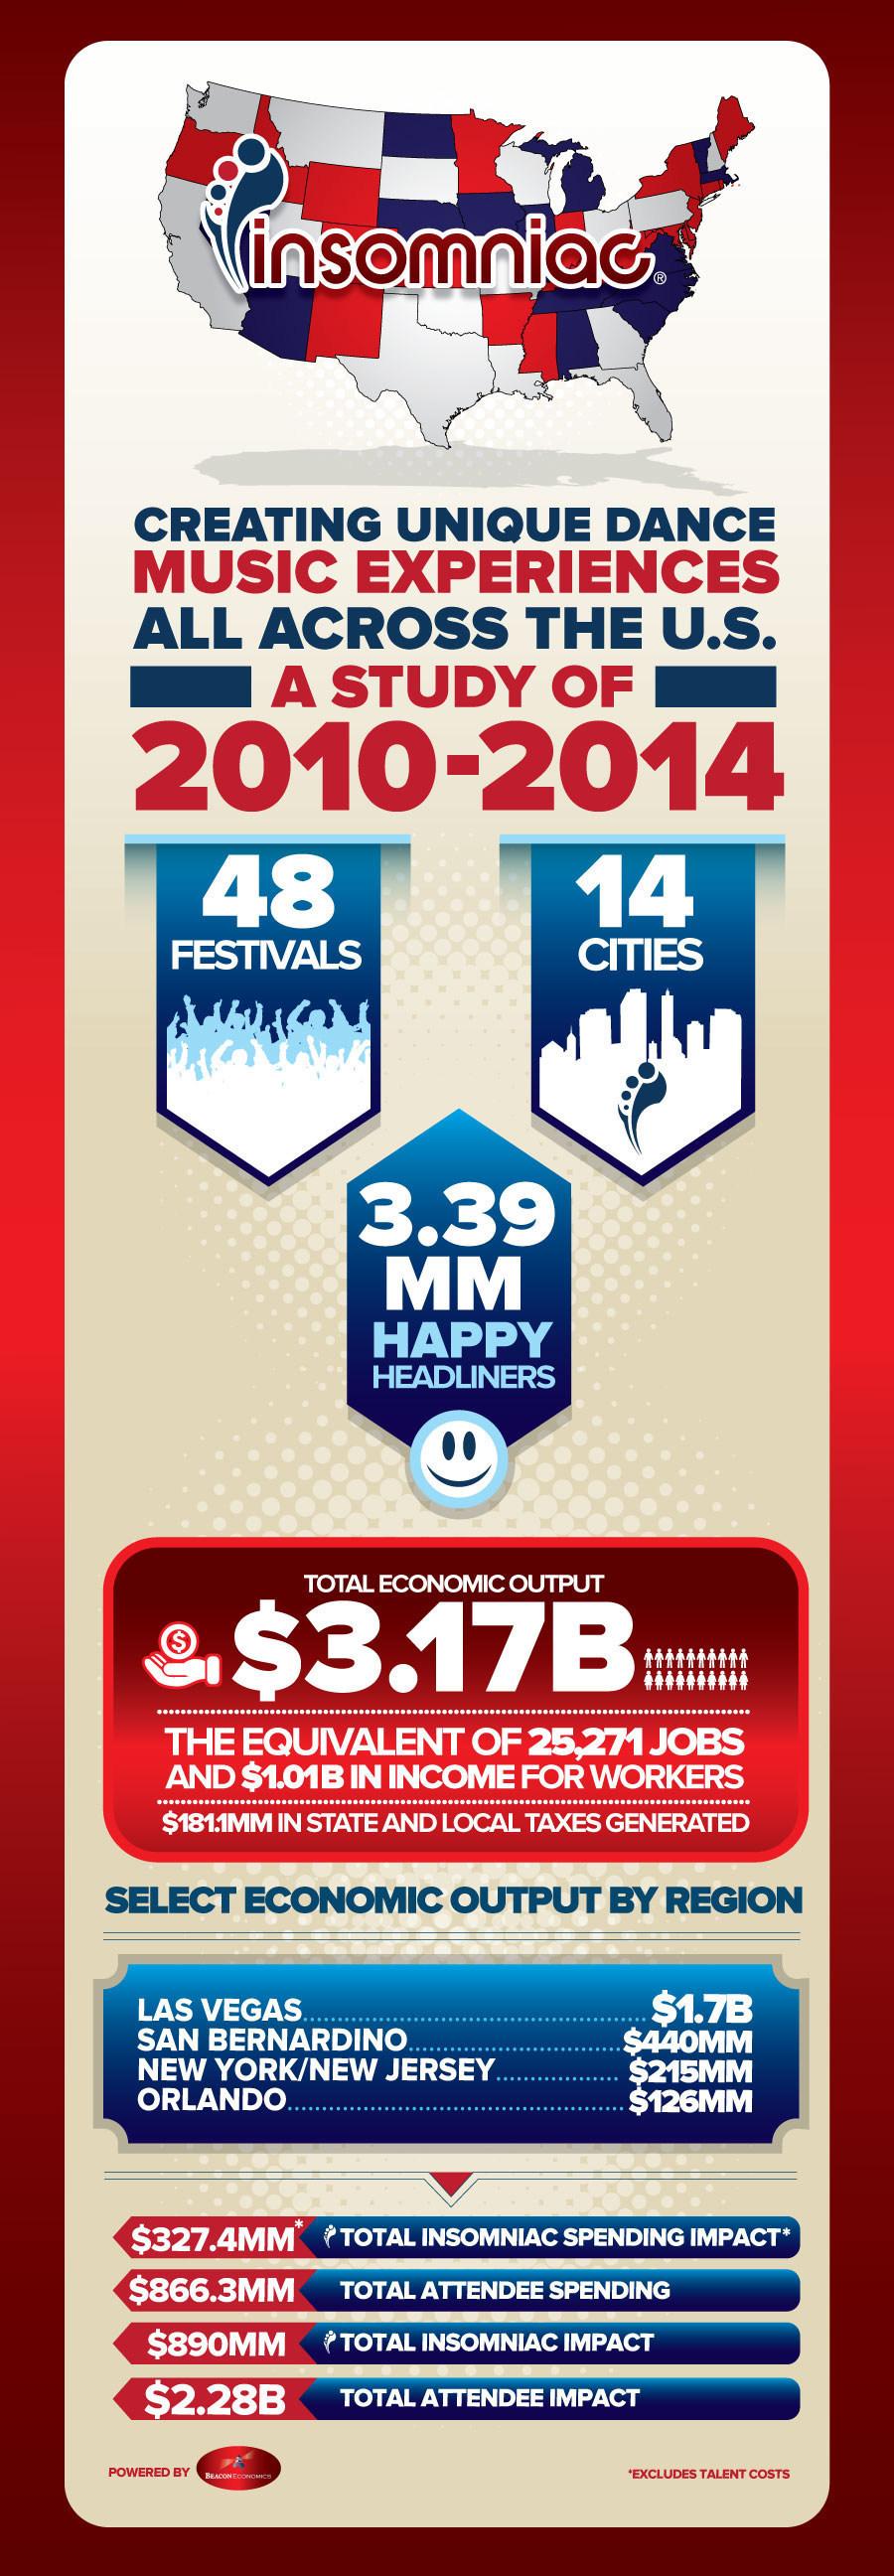 Insomniac Generates More Than $3 Billion For U.S. Economy From 2010-2014 (PRNewsFoto/Insomniac)